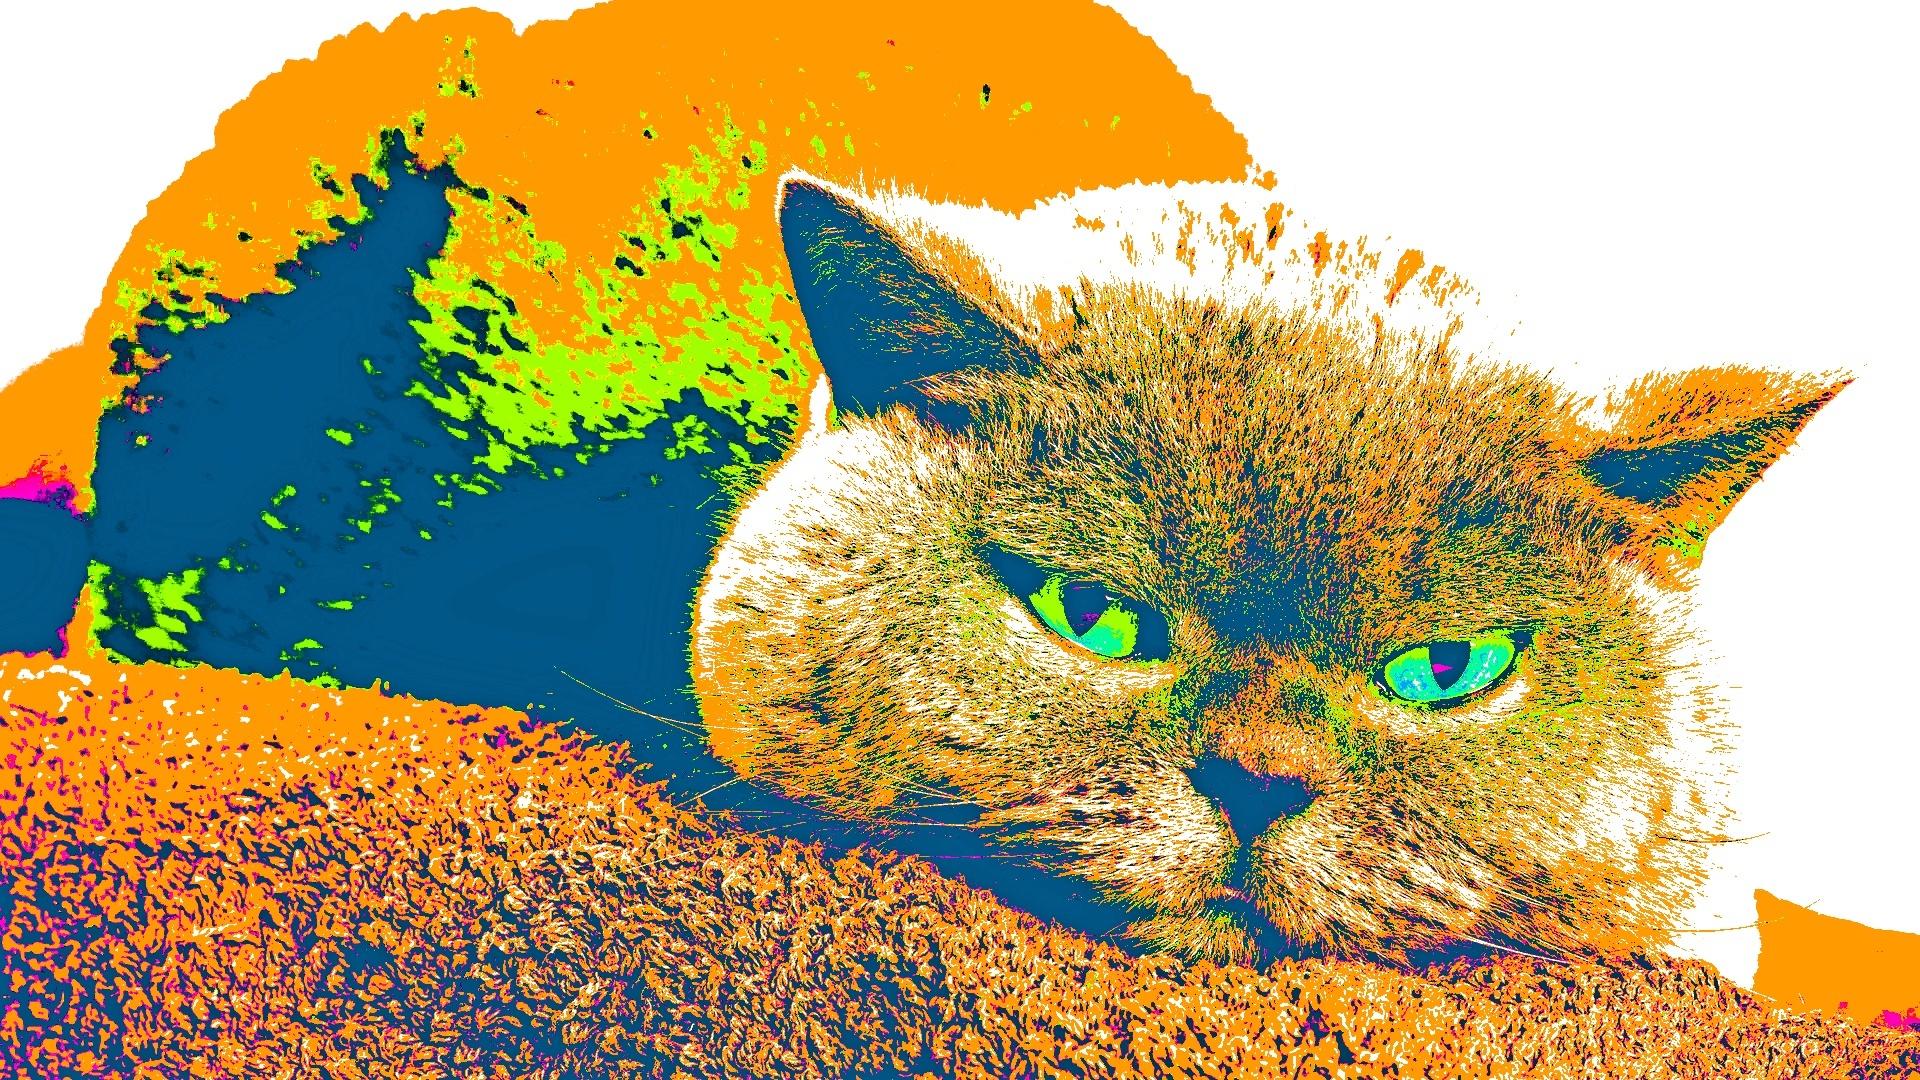 【v粉壁纸】小猫猫可爱卖萌壁纸【12p】